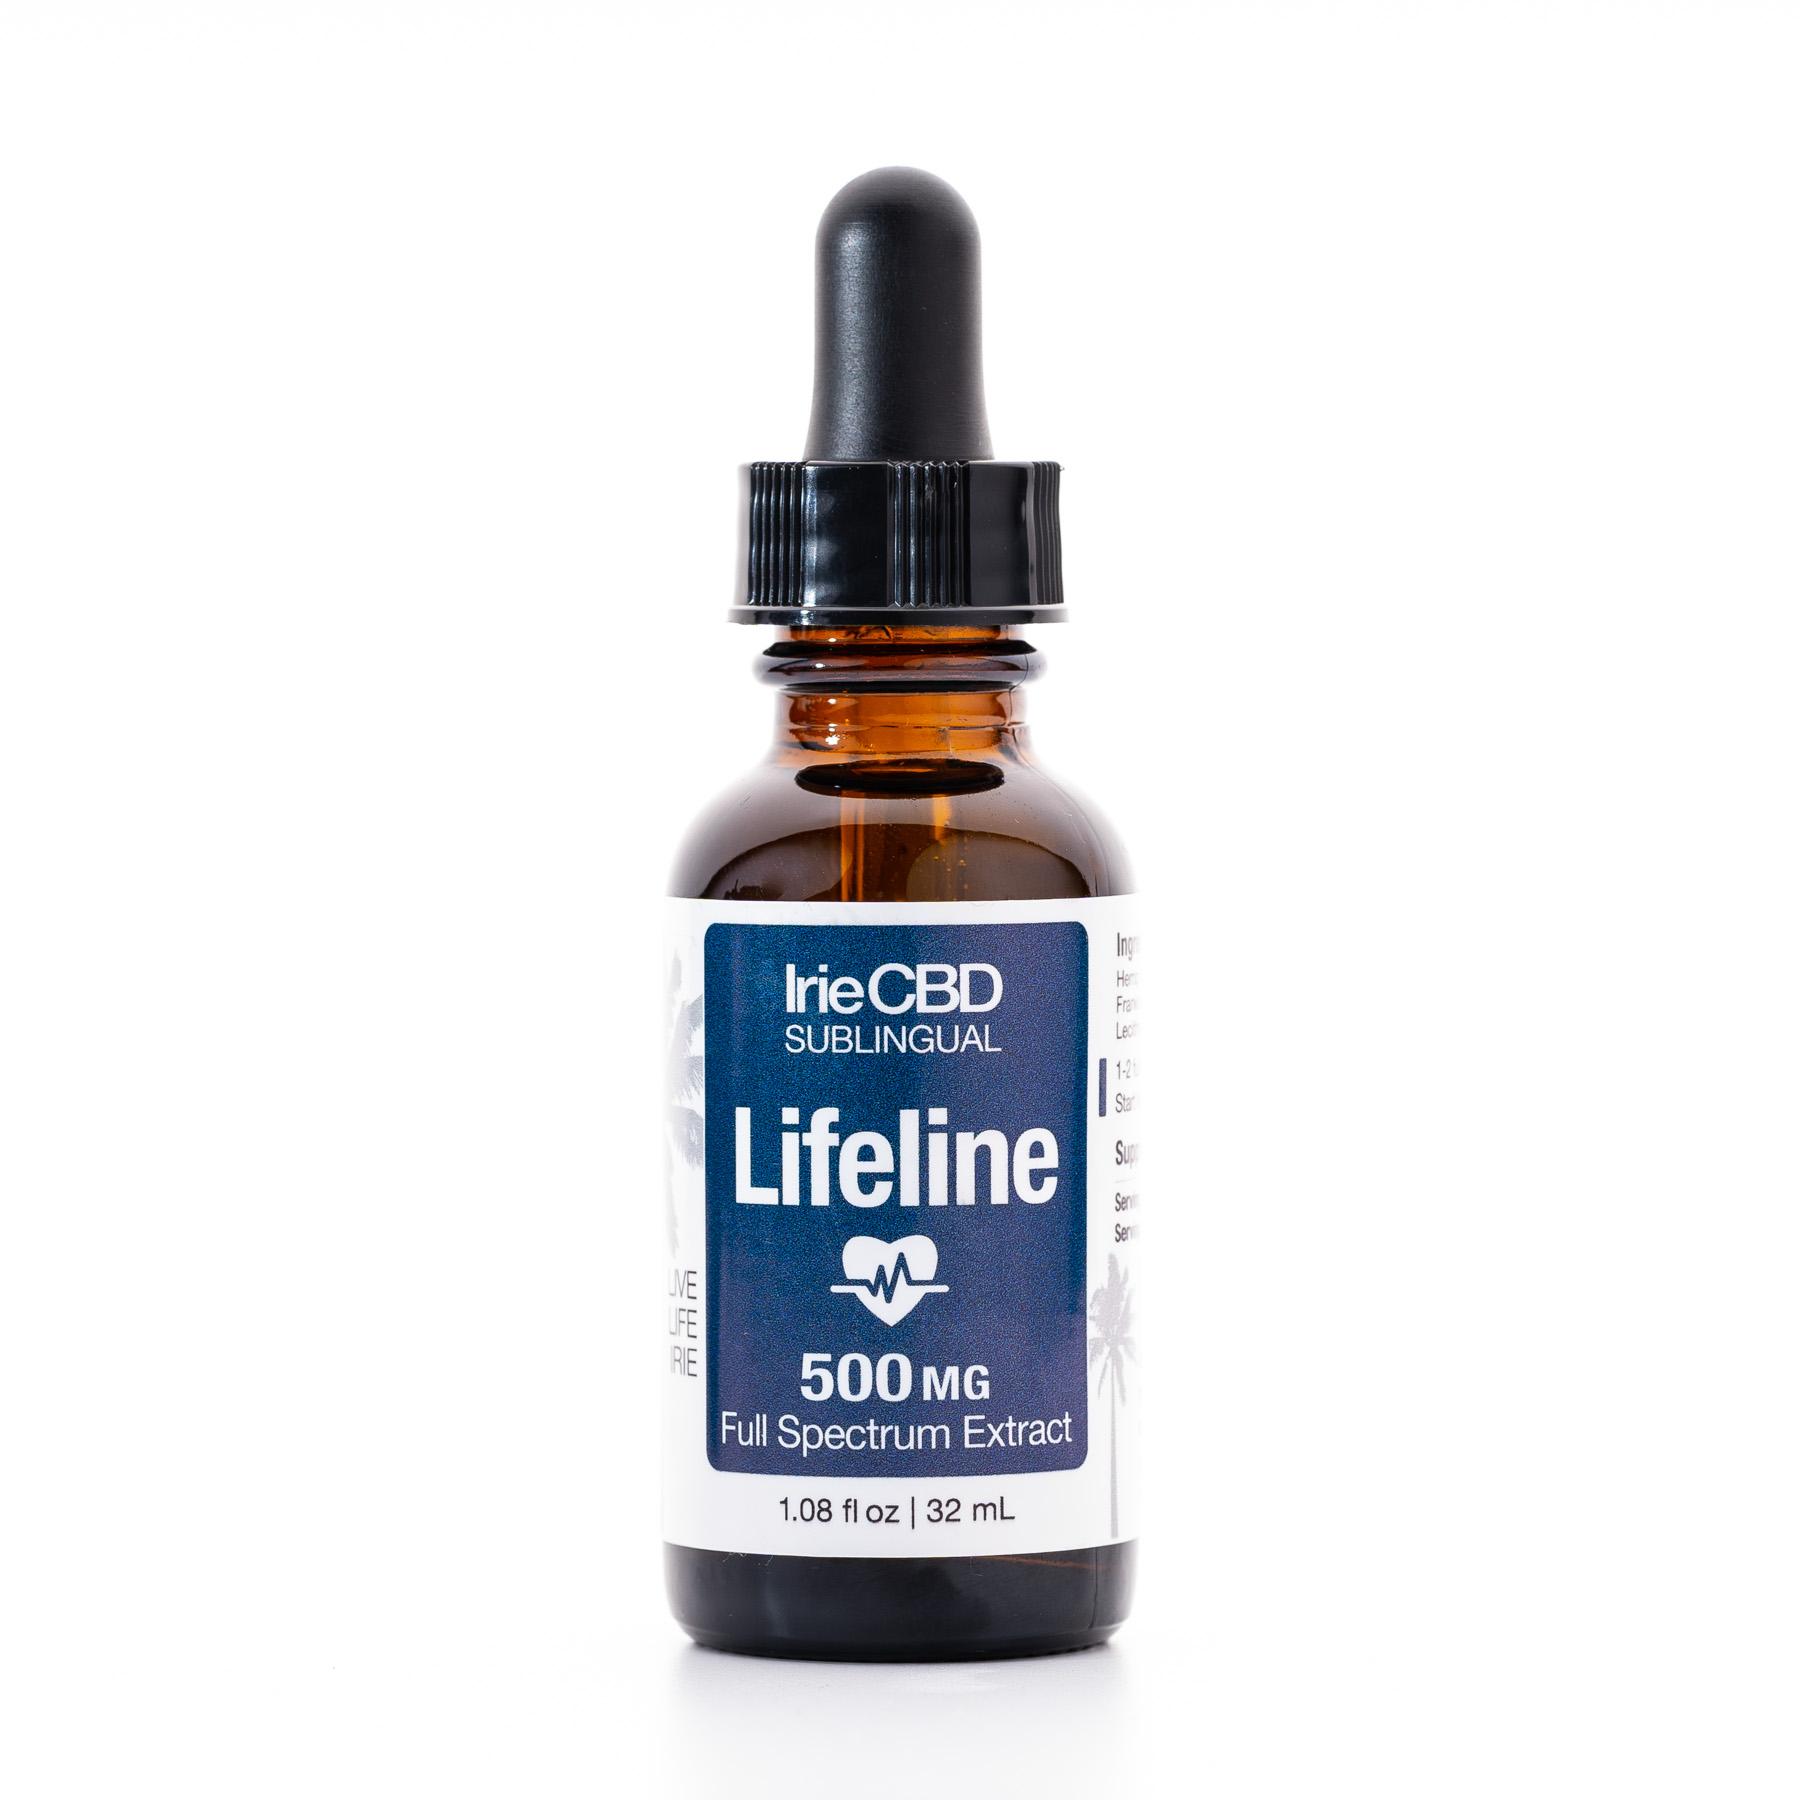 Lifeline 500mg CBD Oil Tincture Irie CBD